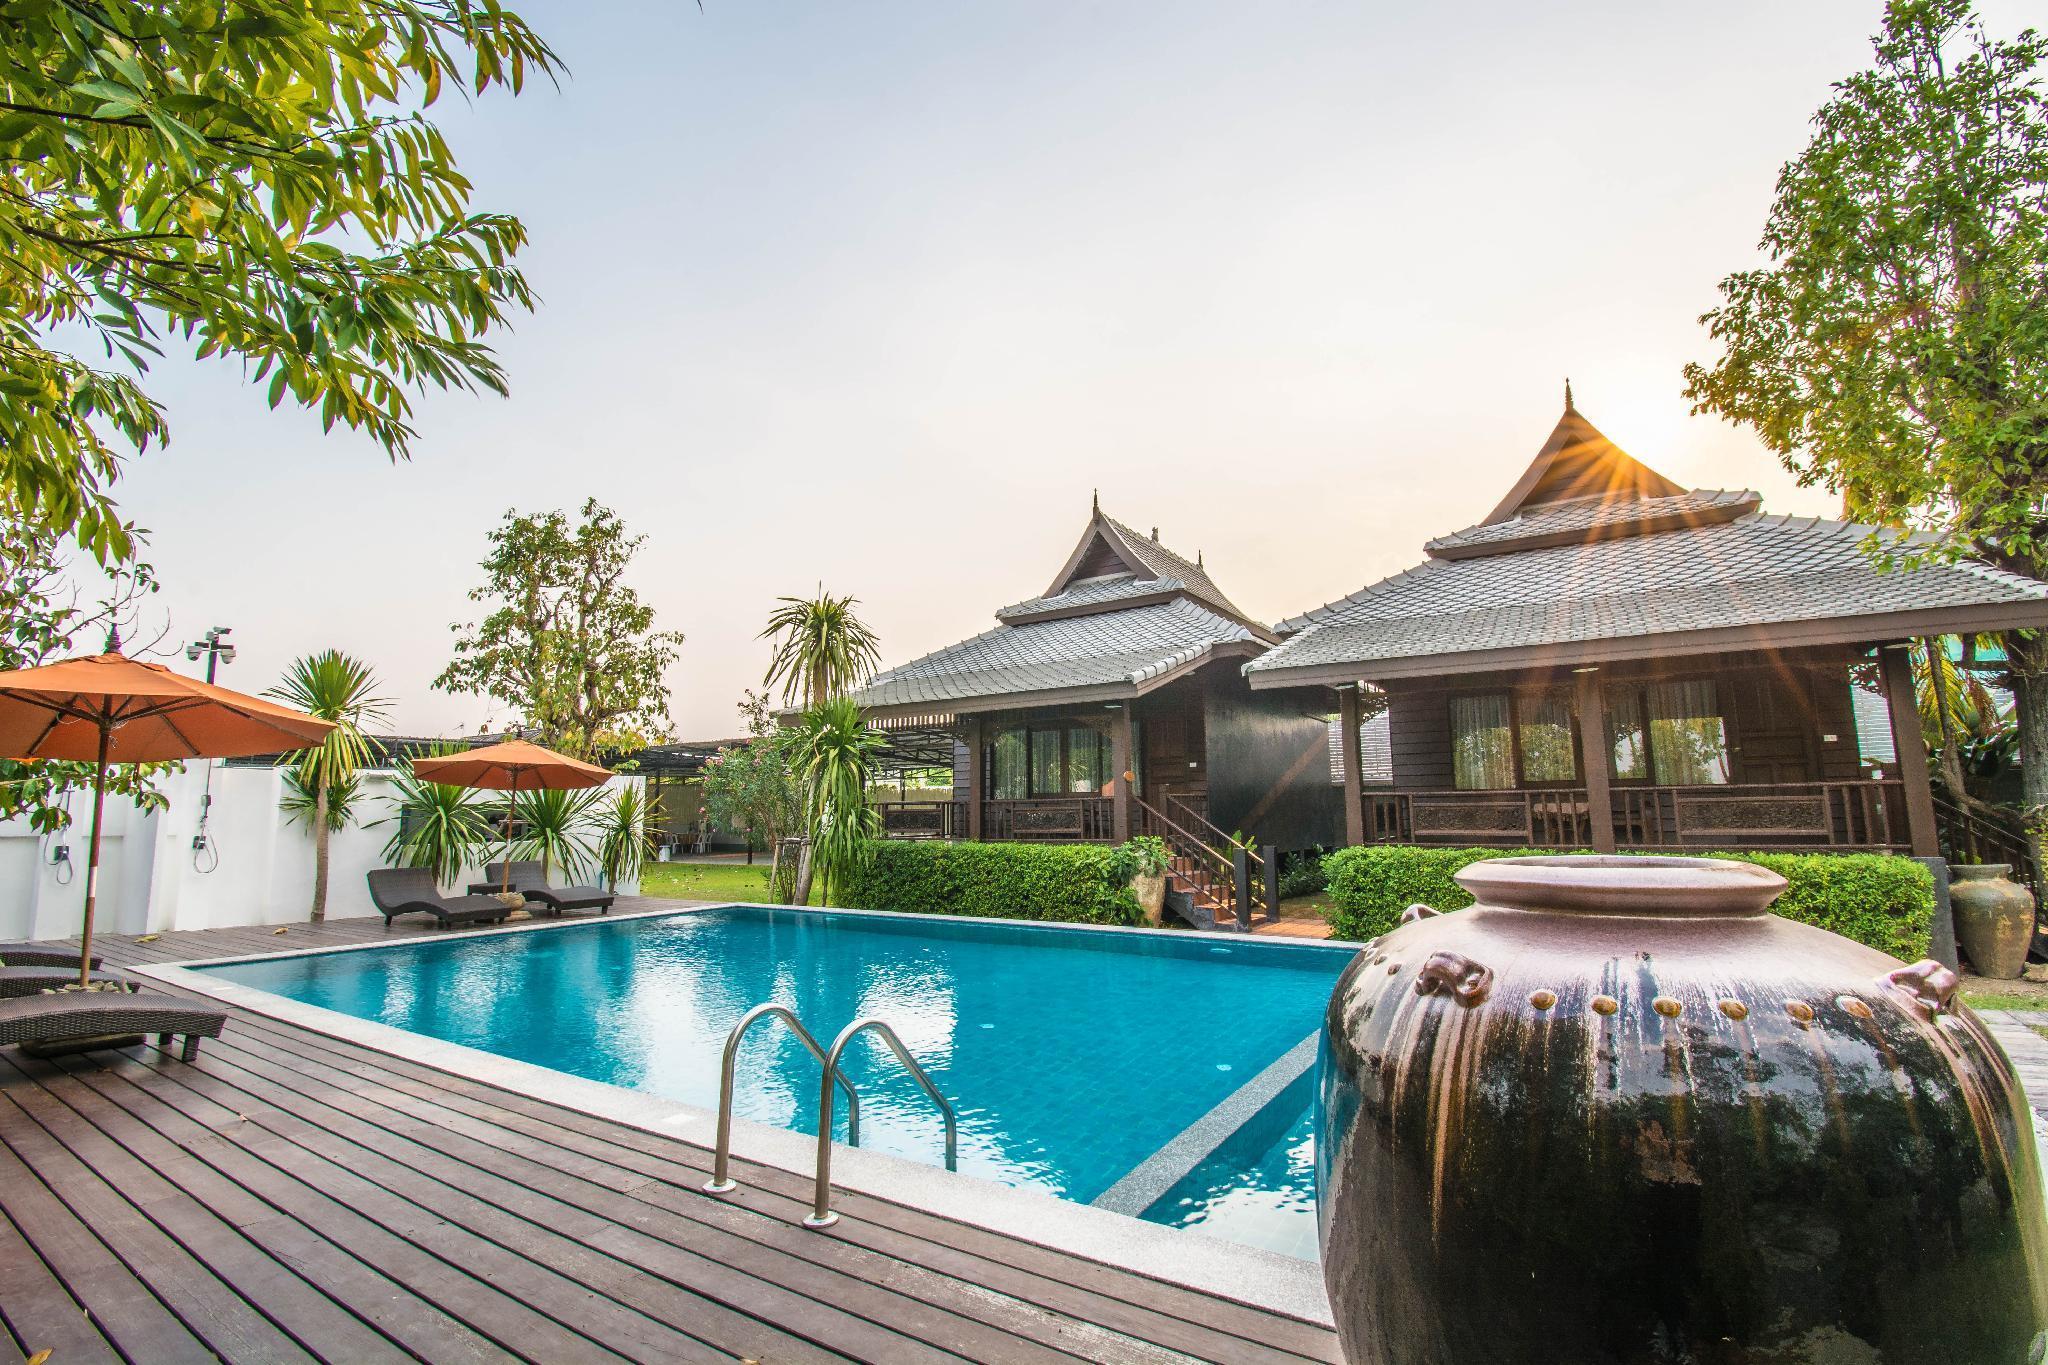 Chiangmai Yunhe Cozy Resort(清迈云和怡养度假村) วิลลา 1 ห้องนอน 1 ห้องน้ำส่วนตัว ขนาด 50 ตร.ม. – หางดง